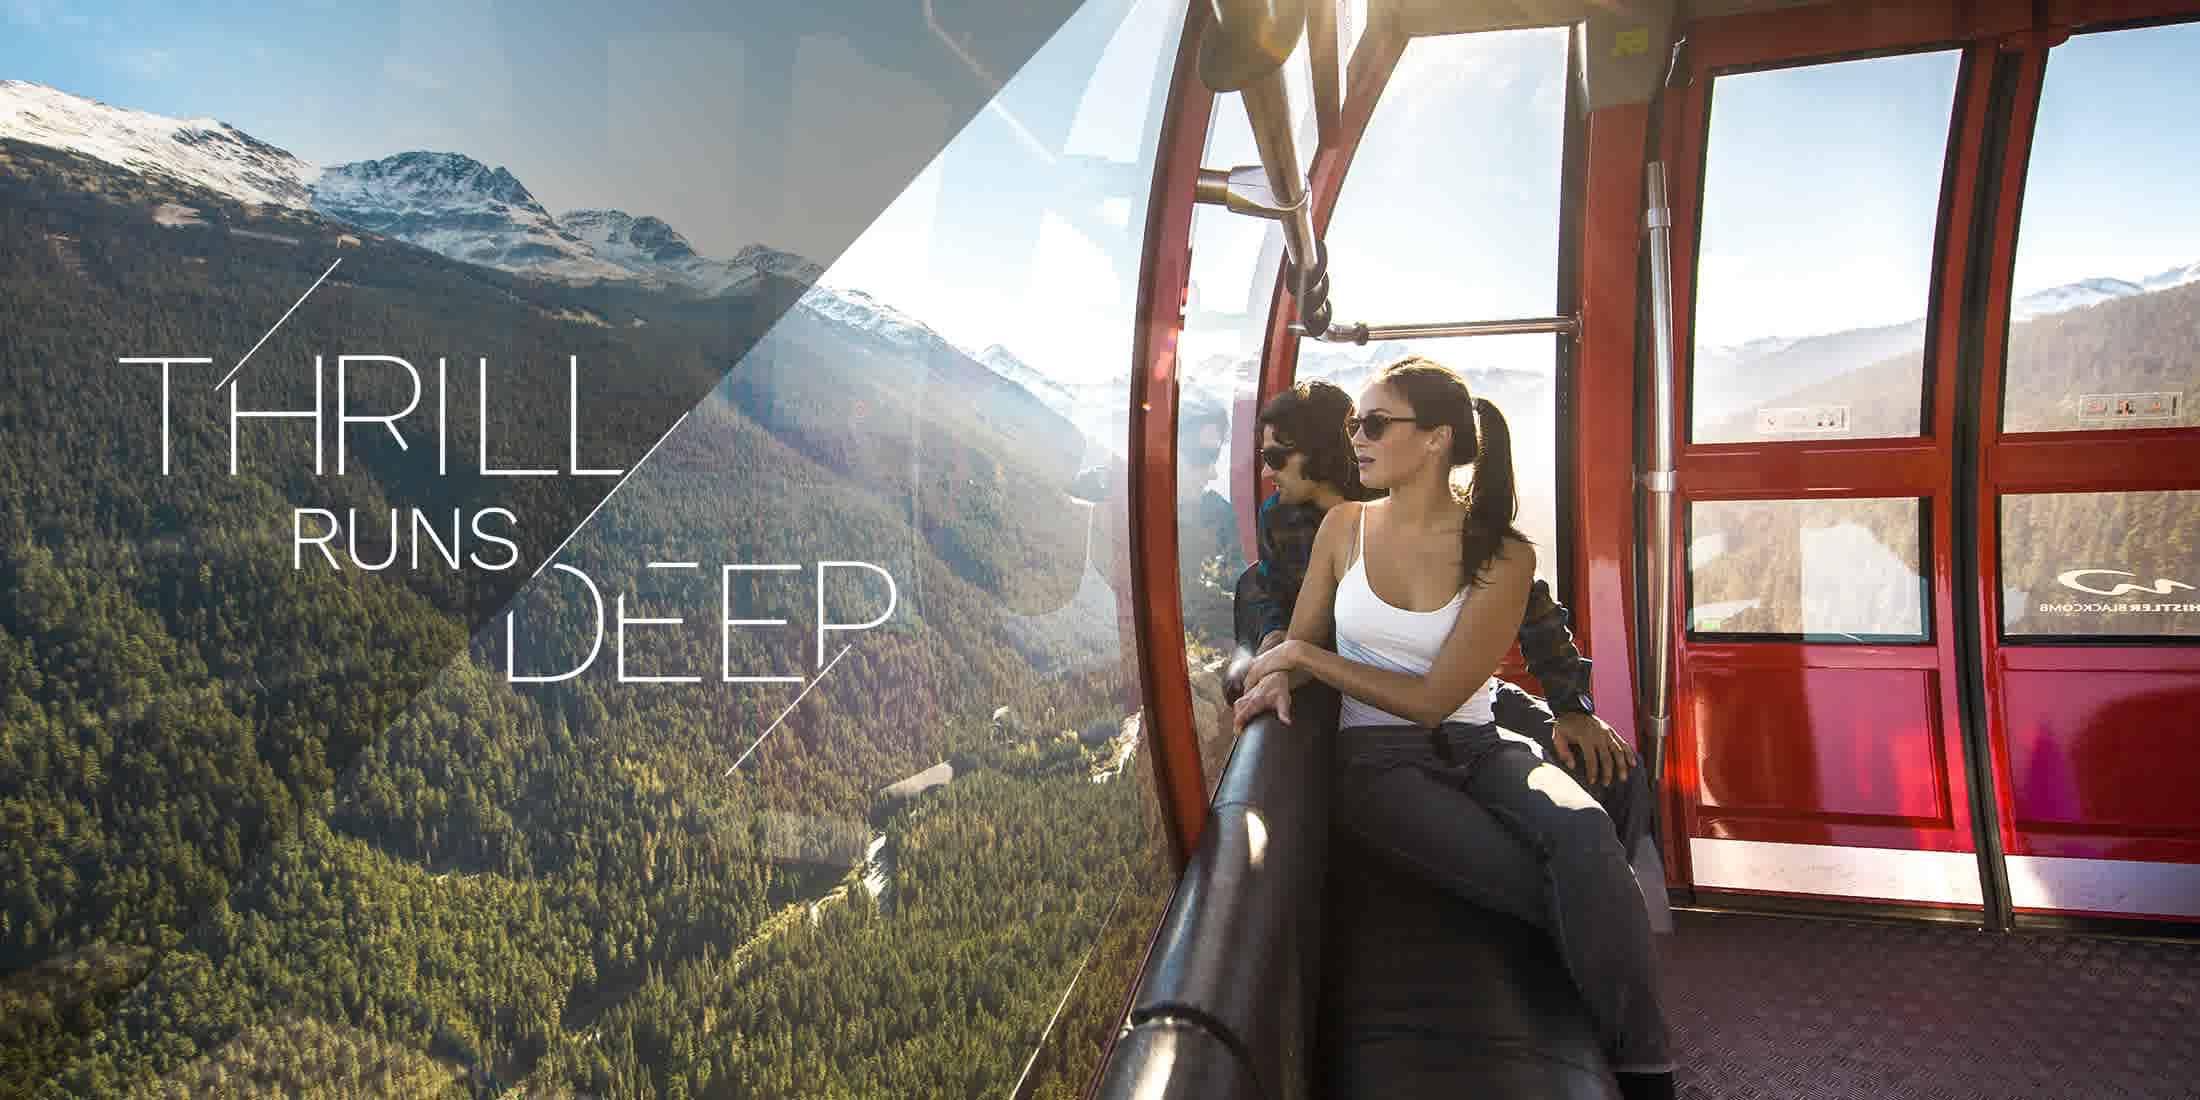 People sightseeing on the PEAK 2 PEAK Gondola in Whistler BC Canada